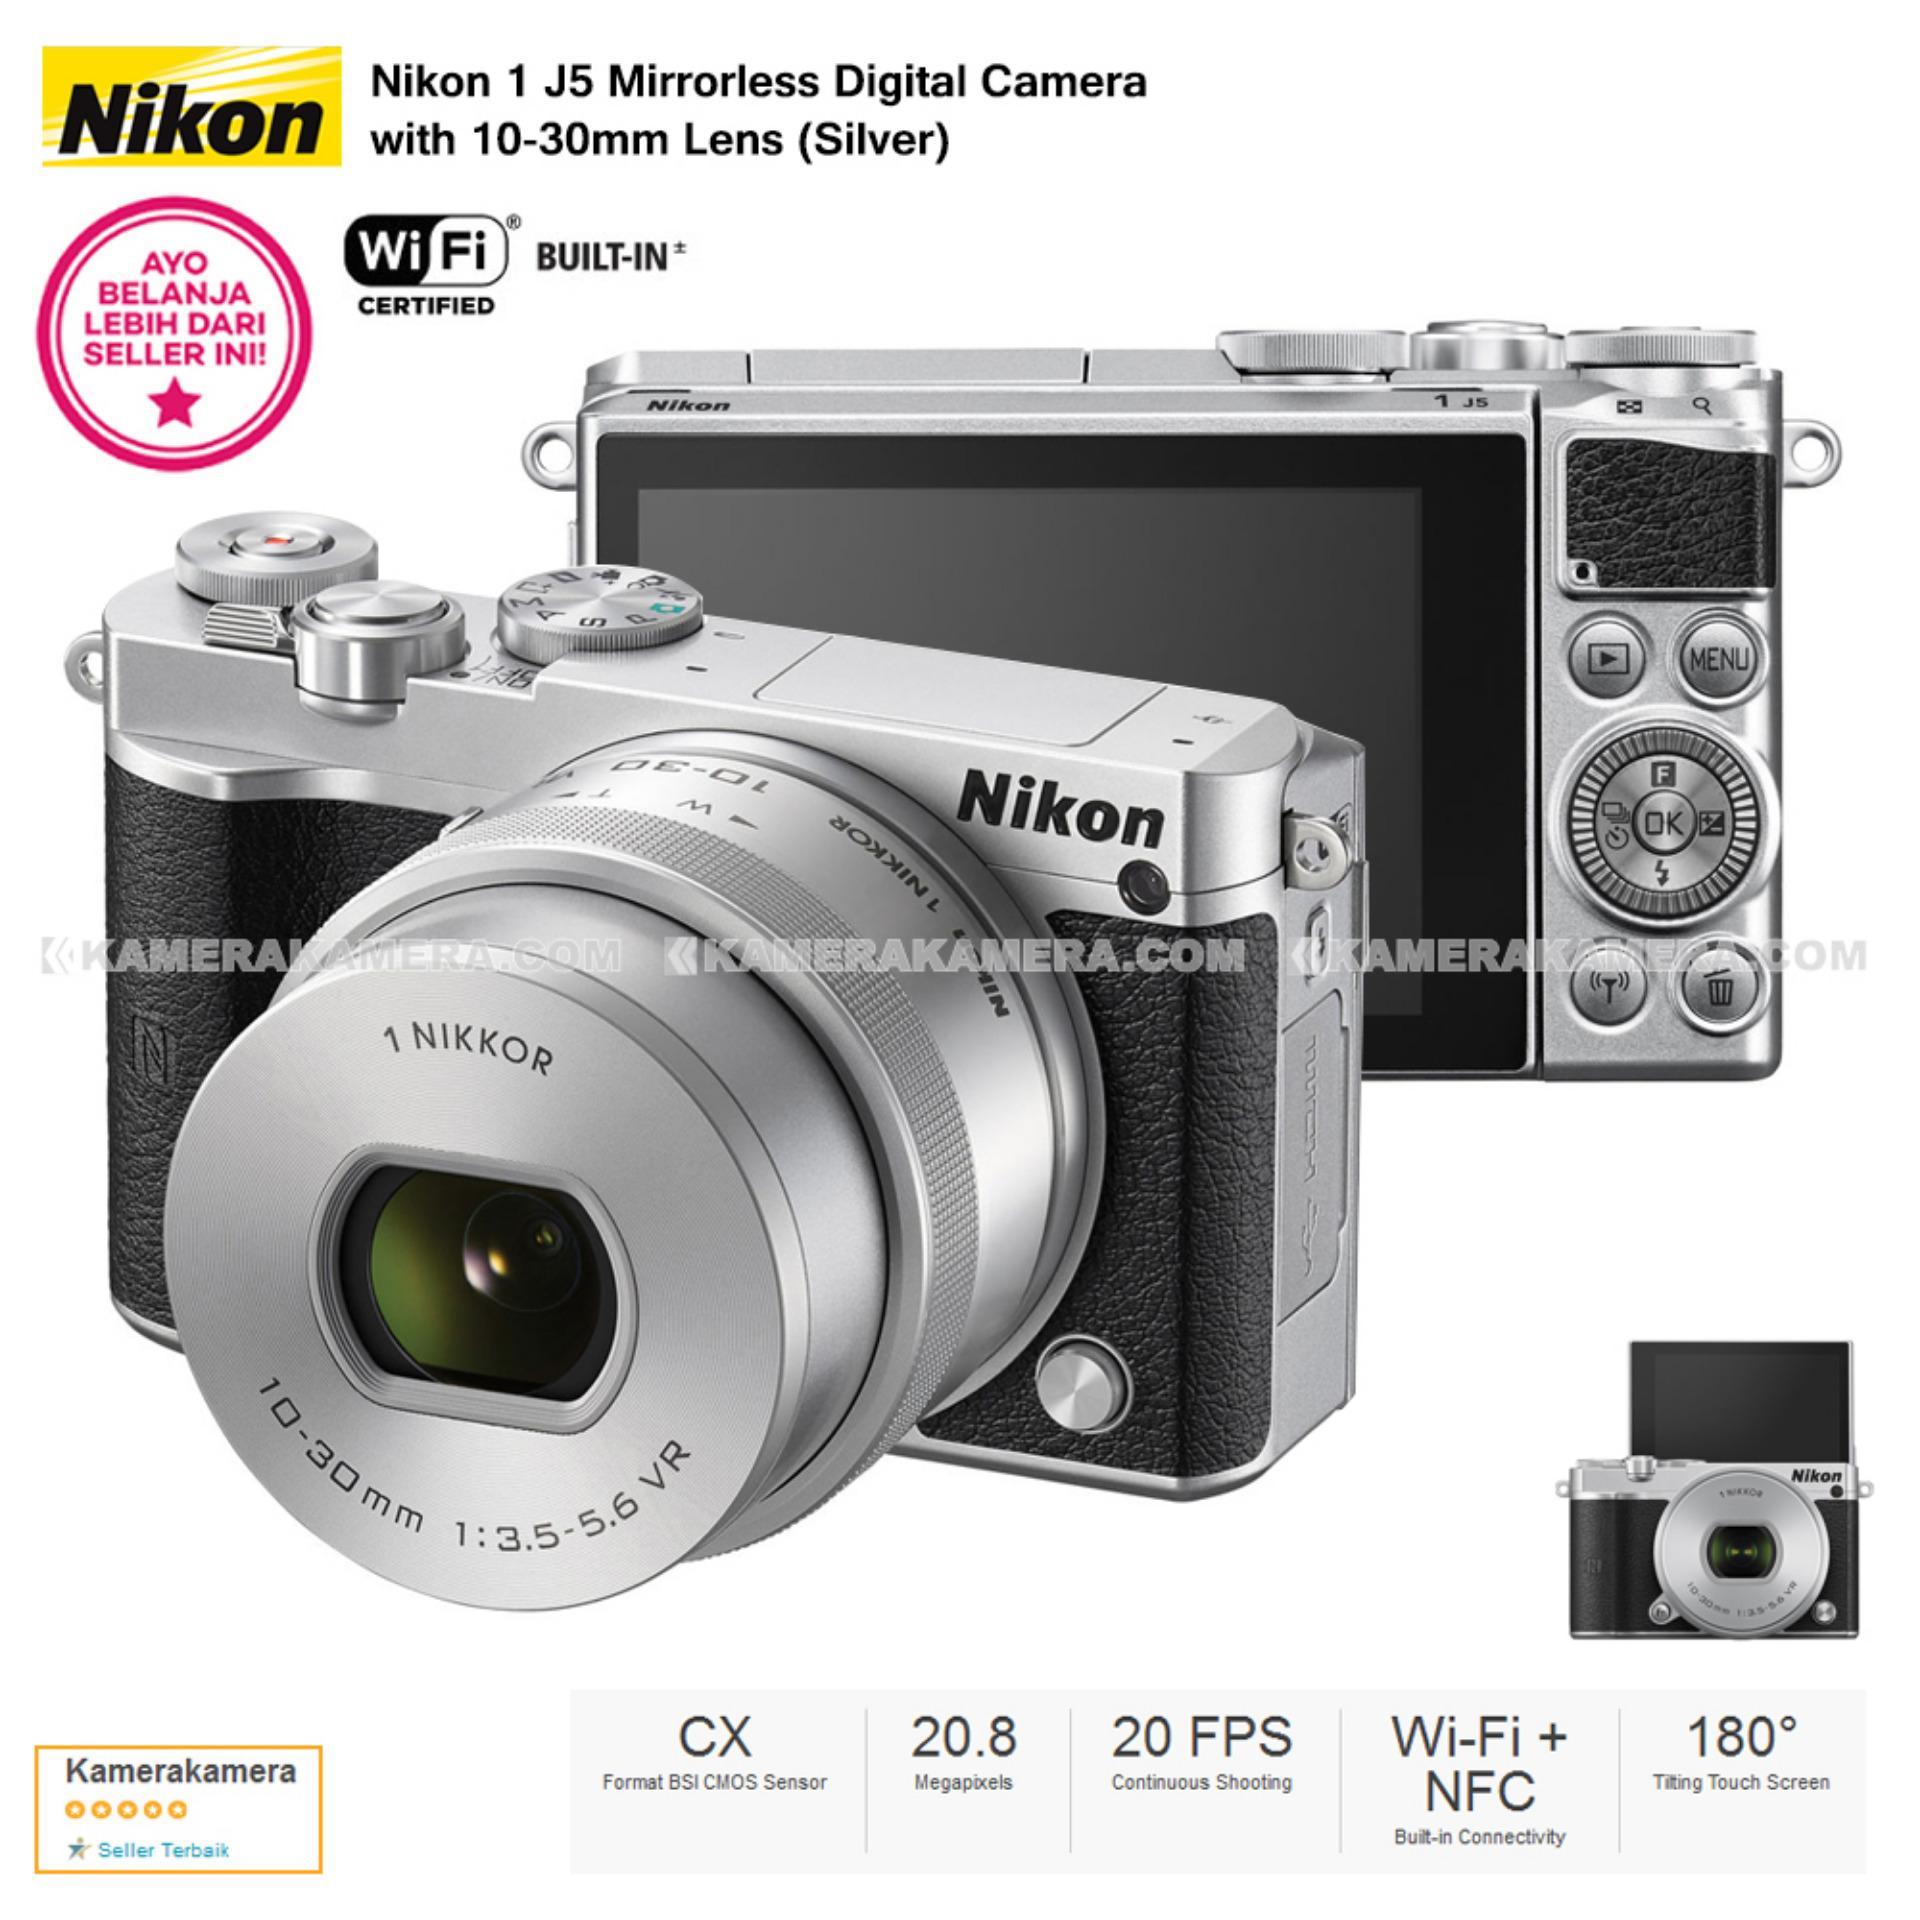 Perbandingan Harga Nikon 1 J5 Silver Wifi 4K Mirrorless Camera Vr 10 30Mm Lens Di Dki Jakarta